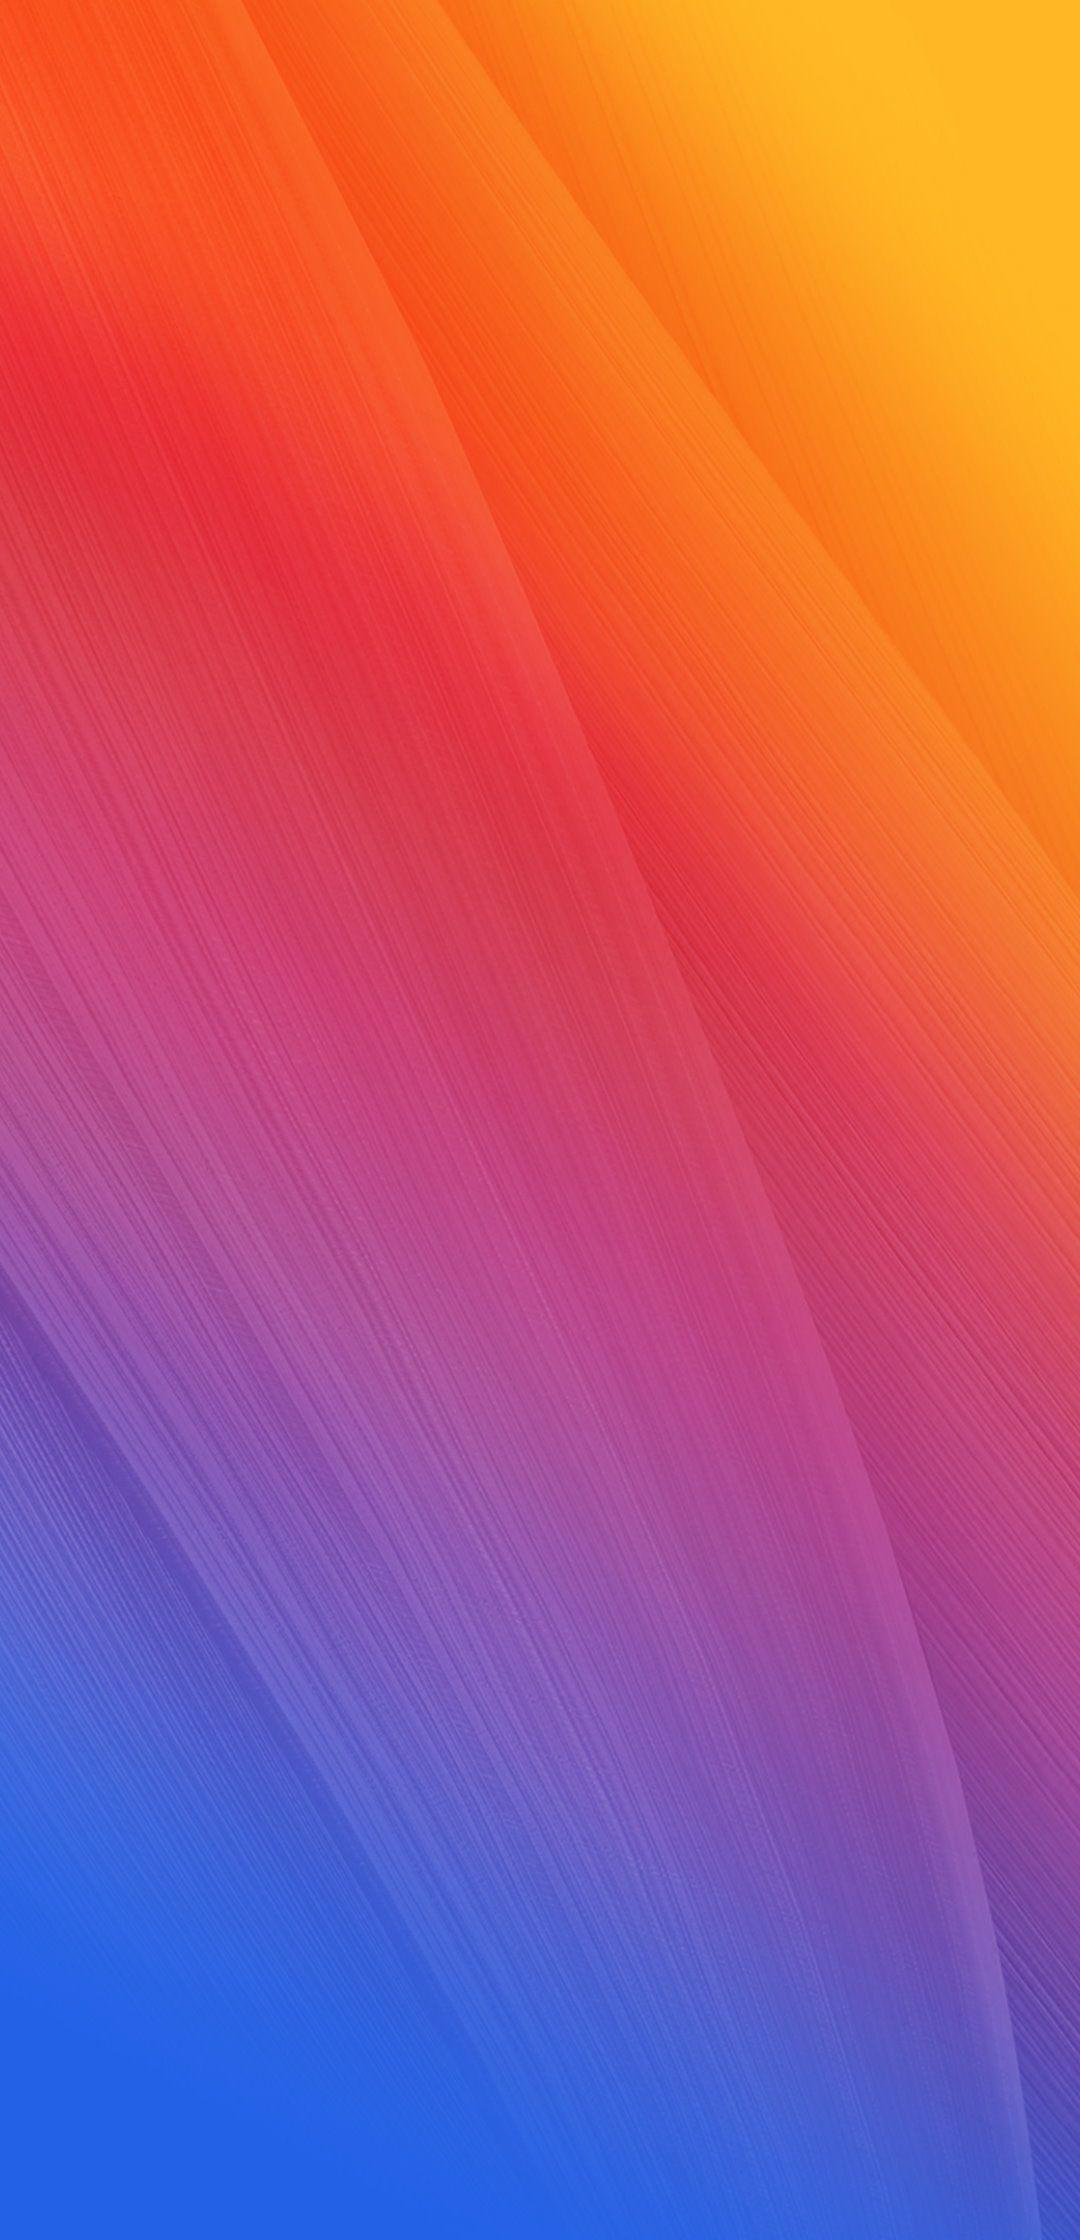 Wallpapers Huawei P20 Pro Pack 2 Wallsphone Sfondi Nel 2019